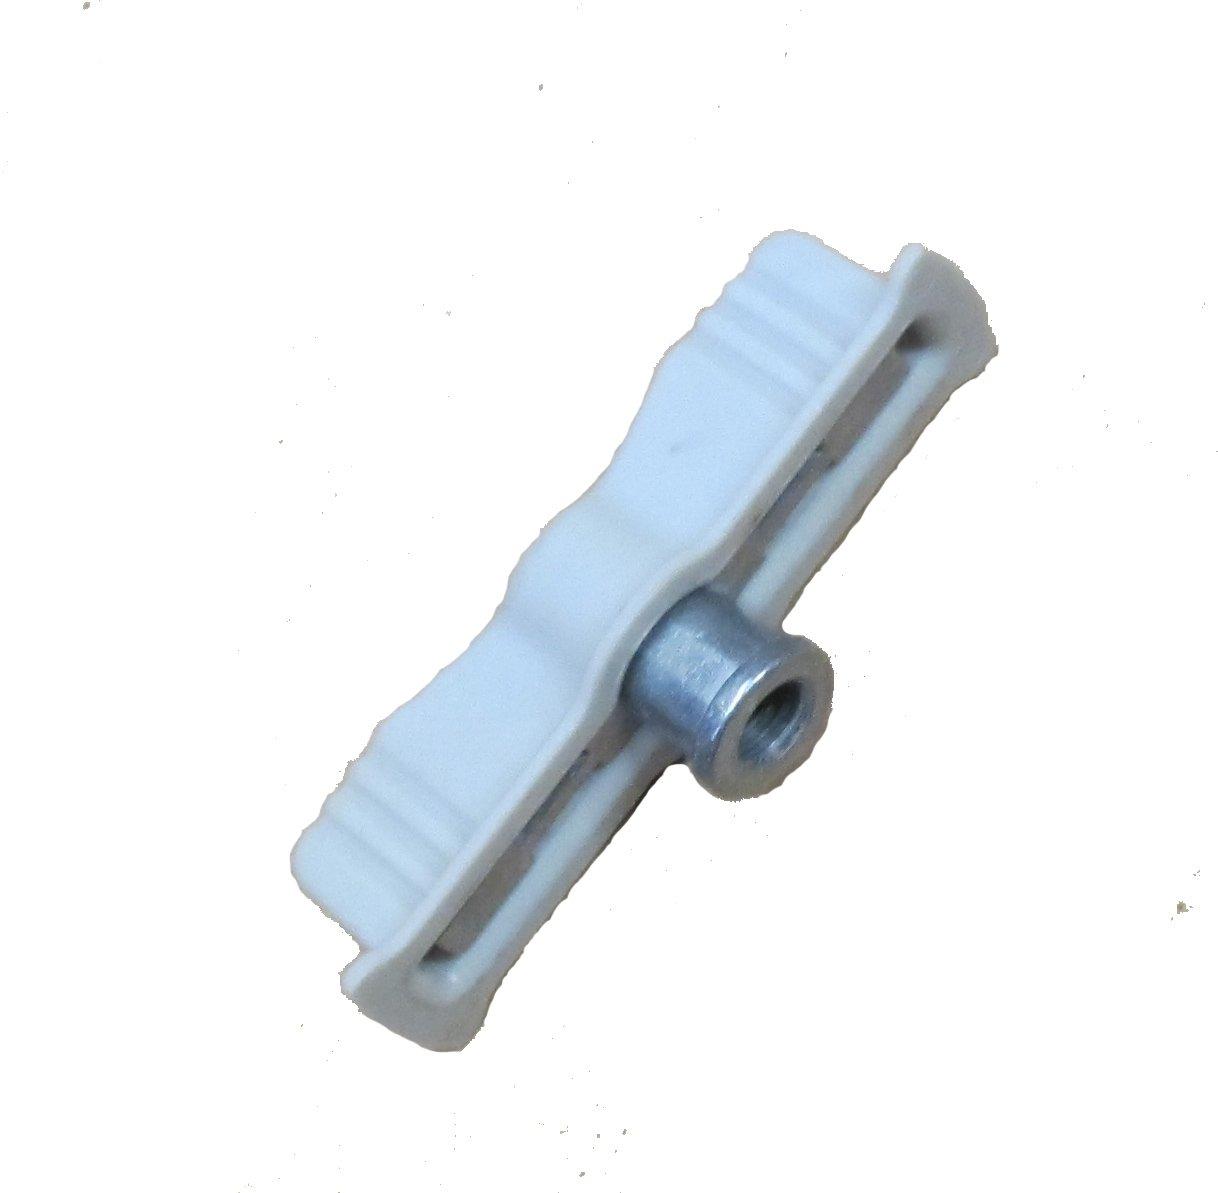 4 5mm Diameter Stihl Recoil Starter Rope (6 Feet) and Starter Handle